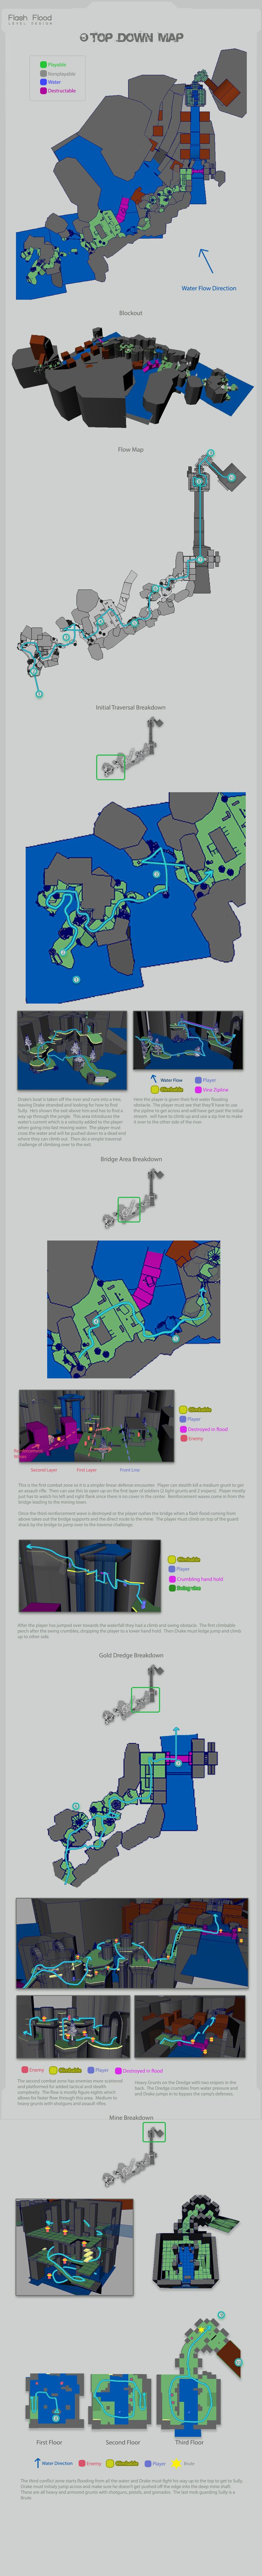 Mission Doc Flash Flood Fantasy MapGame Level